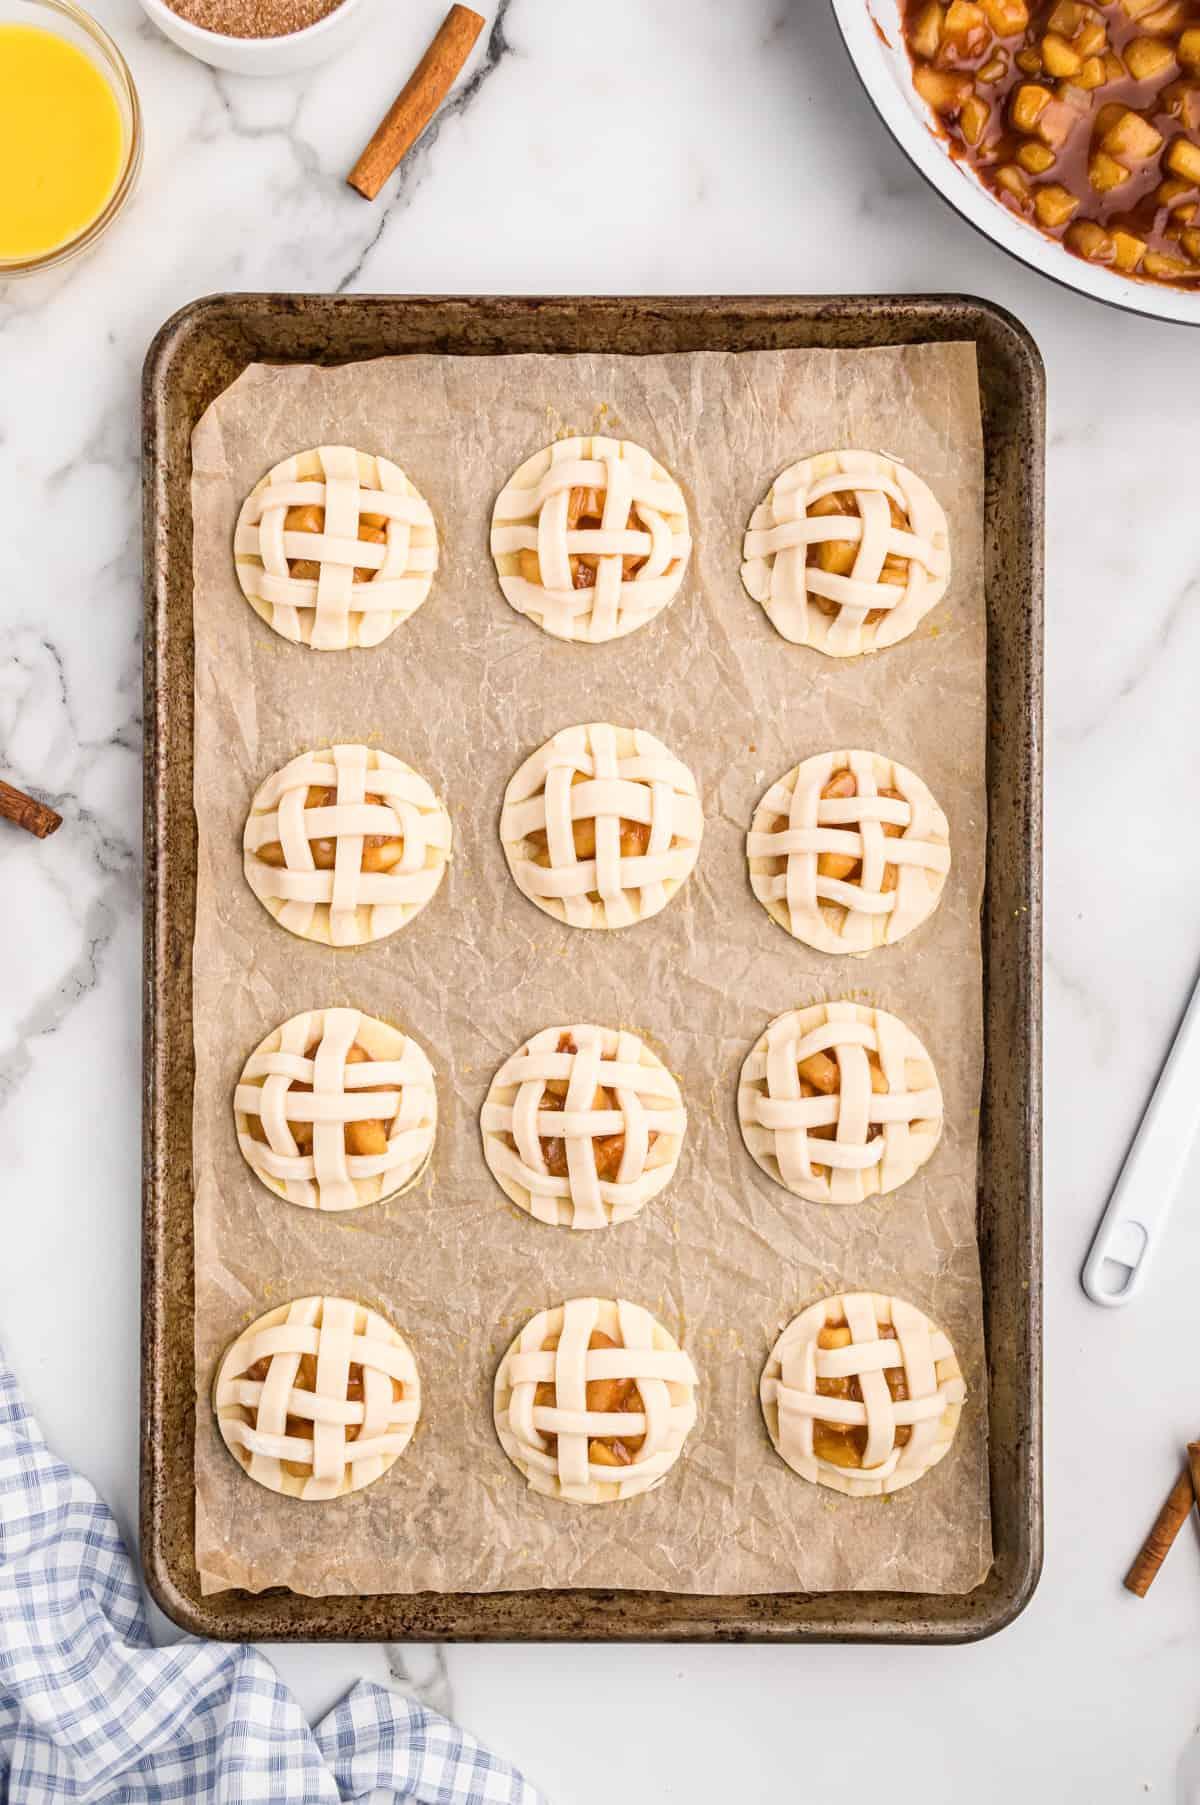 Pie crust strips used to create lattice pattern on top of cookies